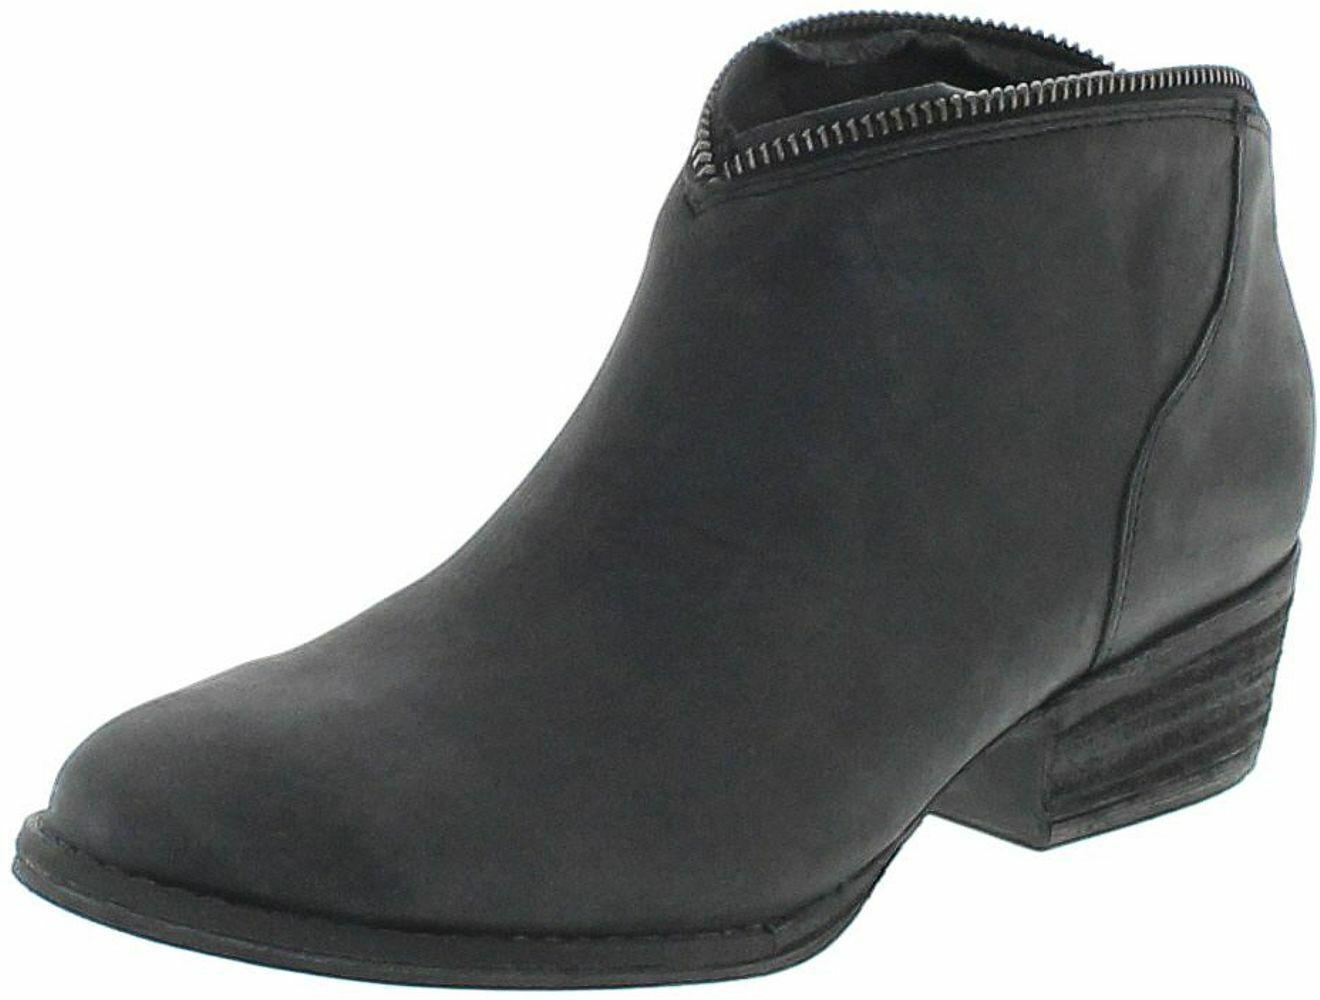 Mezcalero botas 2033 Sofia estrella negra fashion botín para señoras negro